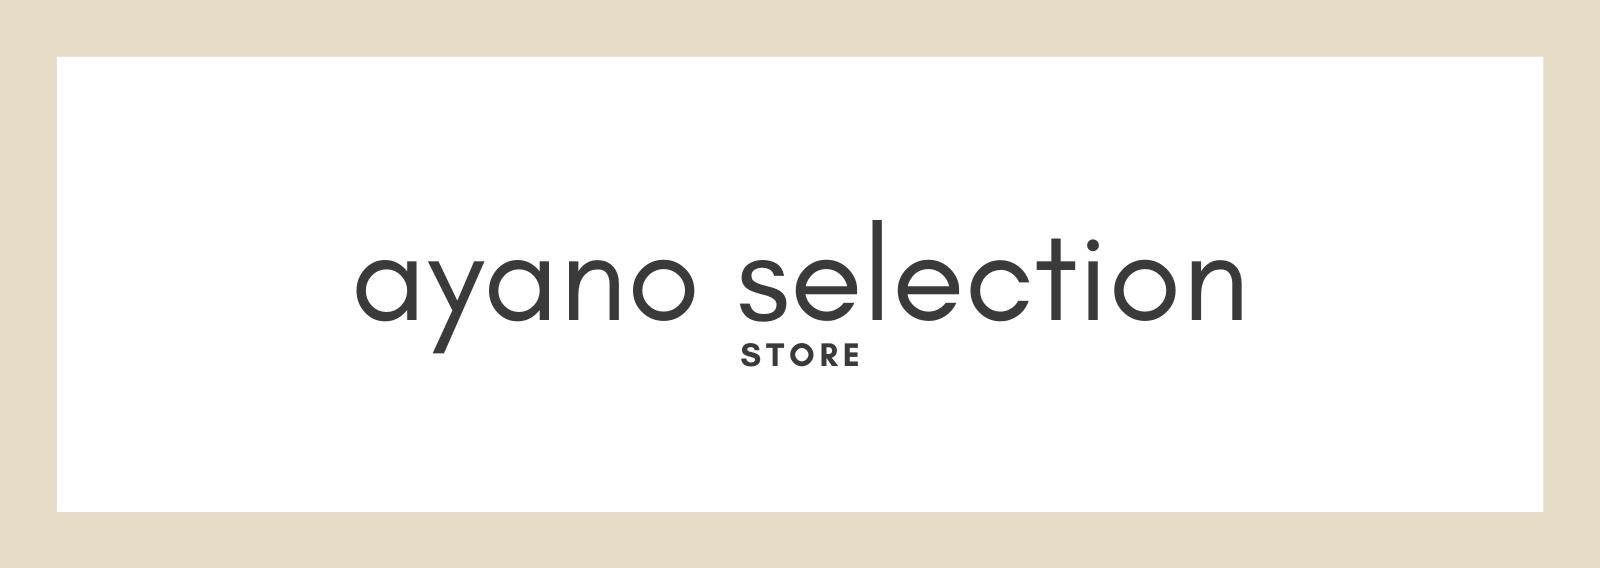 ayano selection